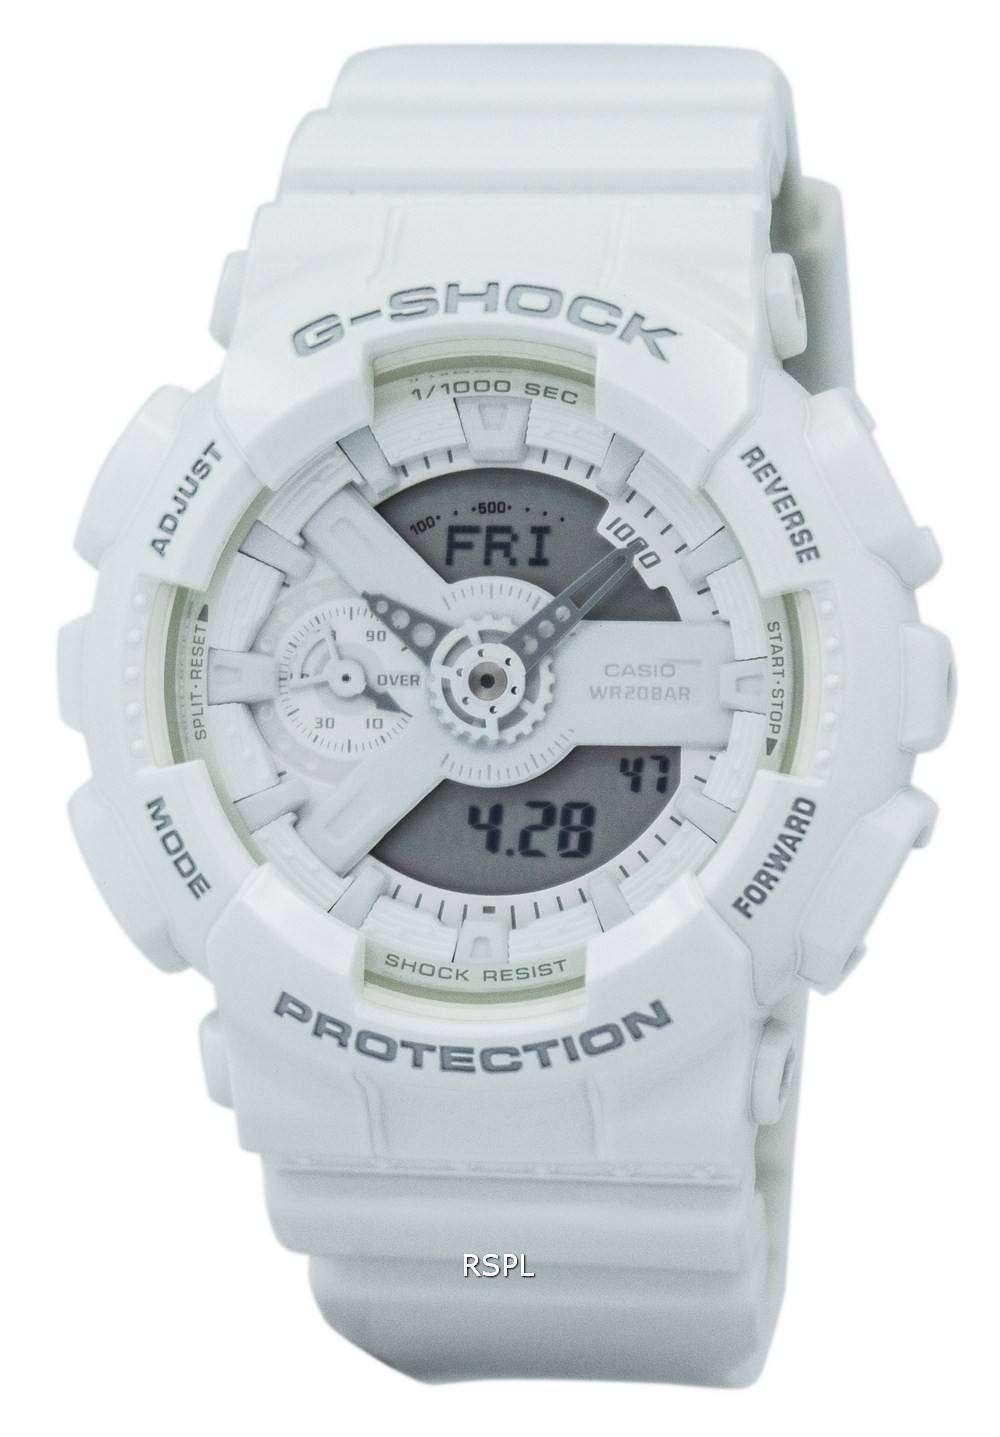 3f1d8f75a1d39 Casio G-Shock S Series Analog Digital World Time GMA-S110CM-7A1 Women s  Watch